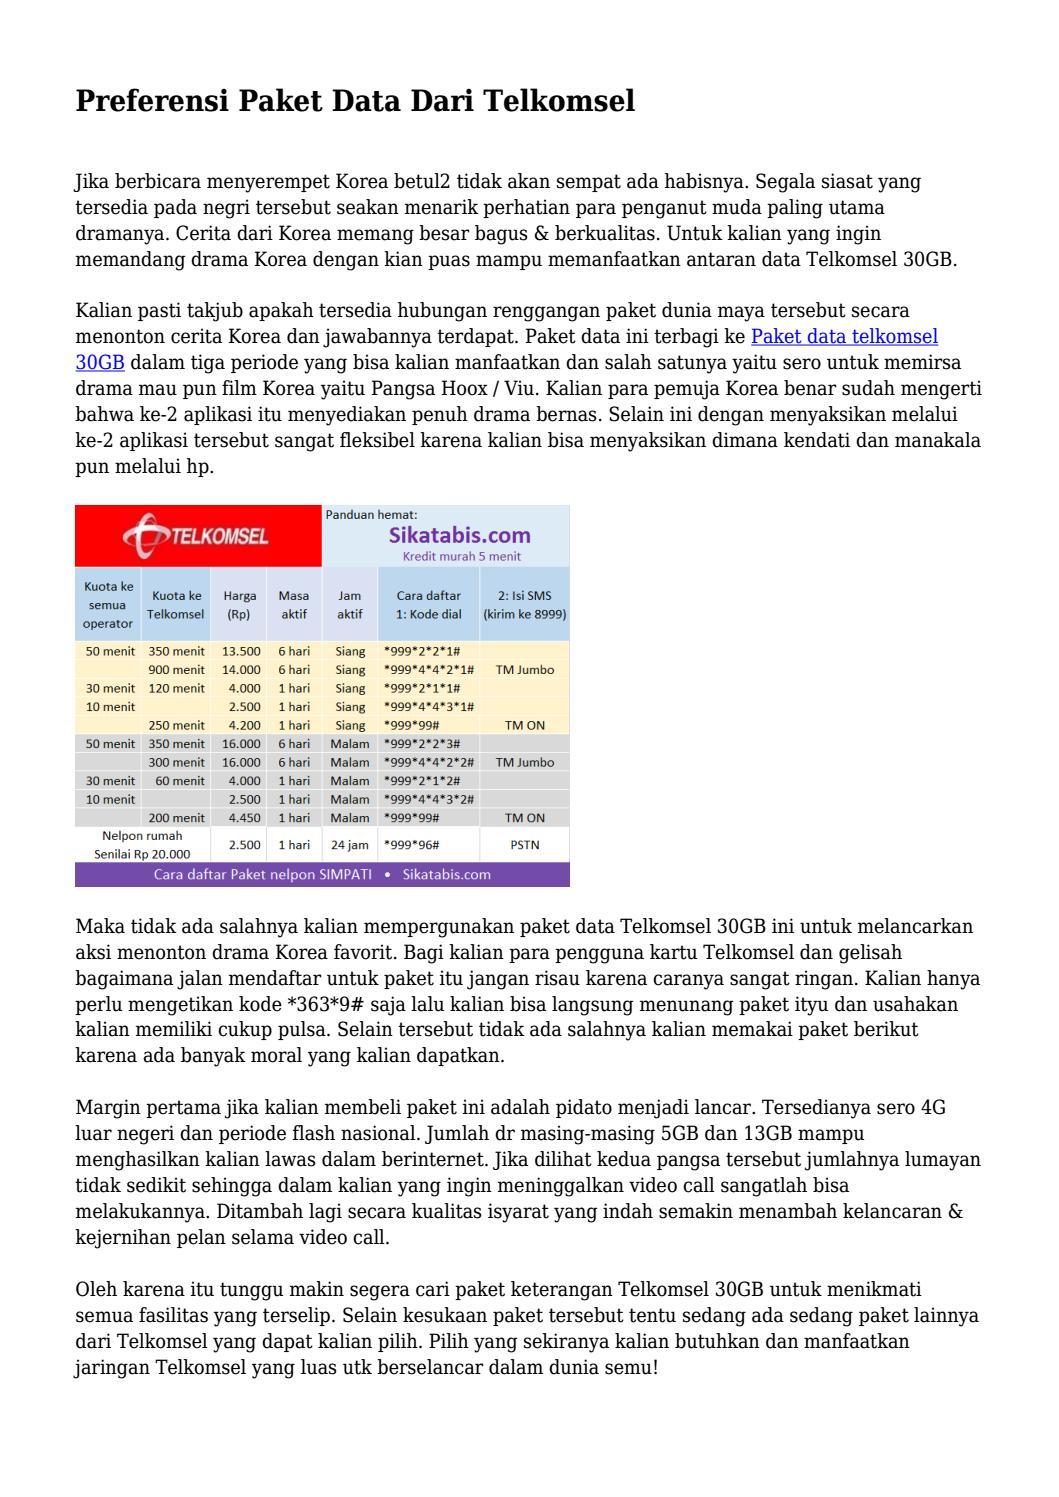 Preferensi Paket Data Dari Telkomsel By Kunciteknoarea Issuu